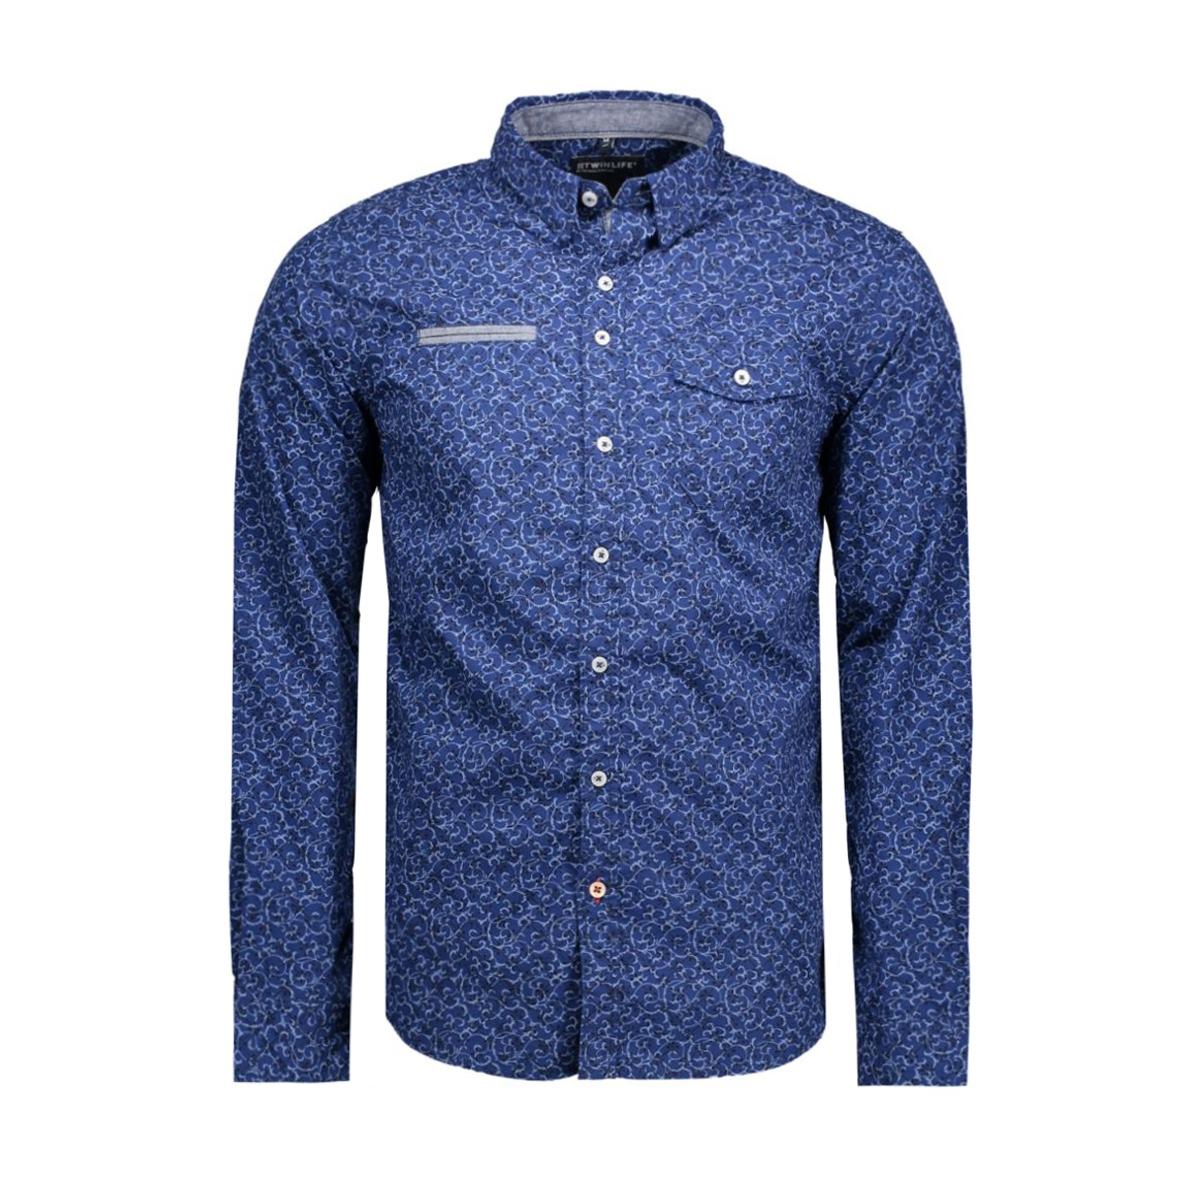 msh651639 twinlife overhemd 6553